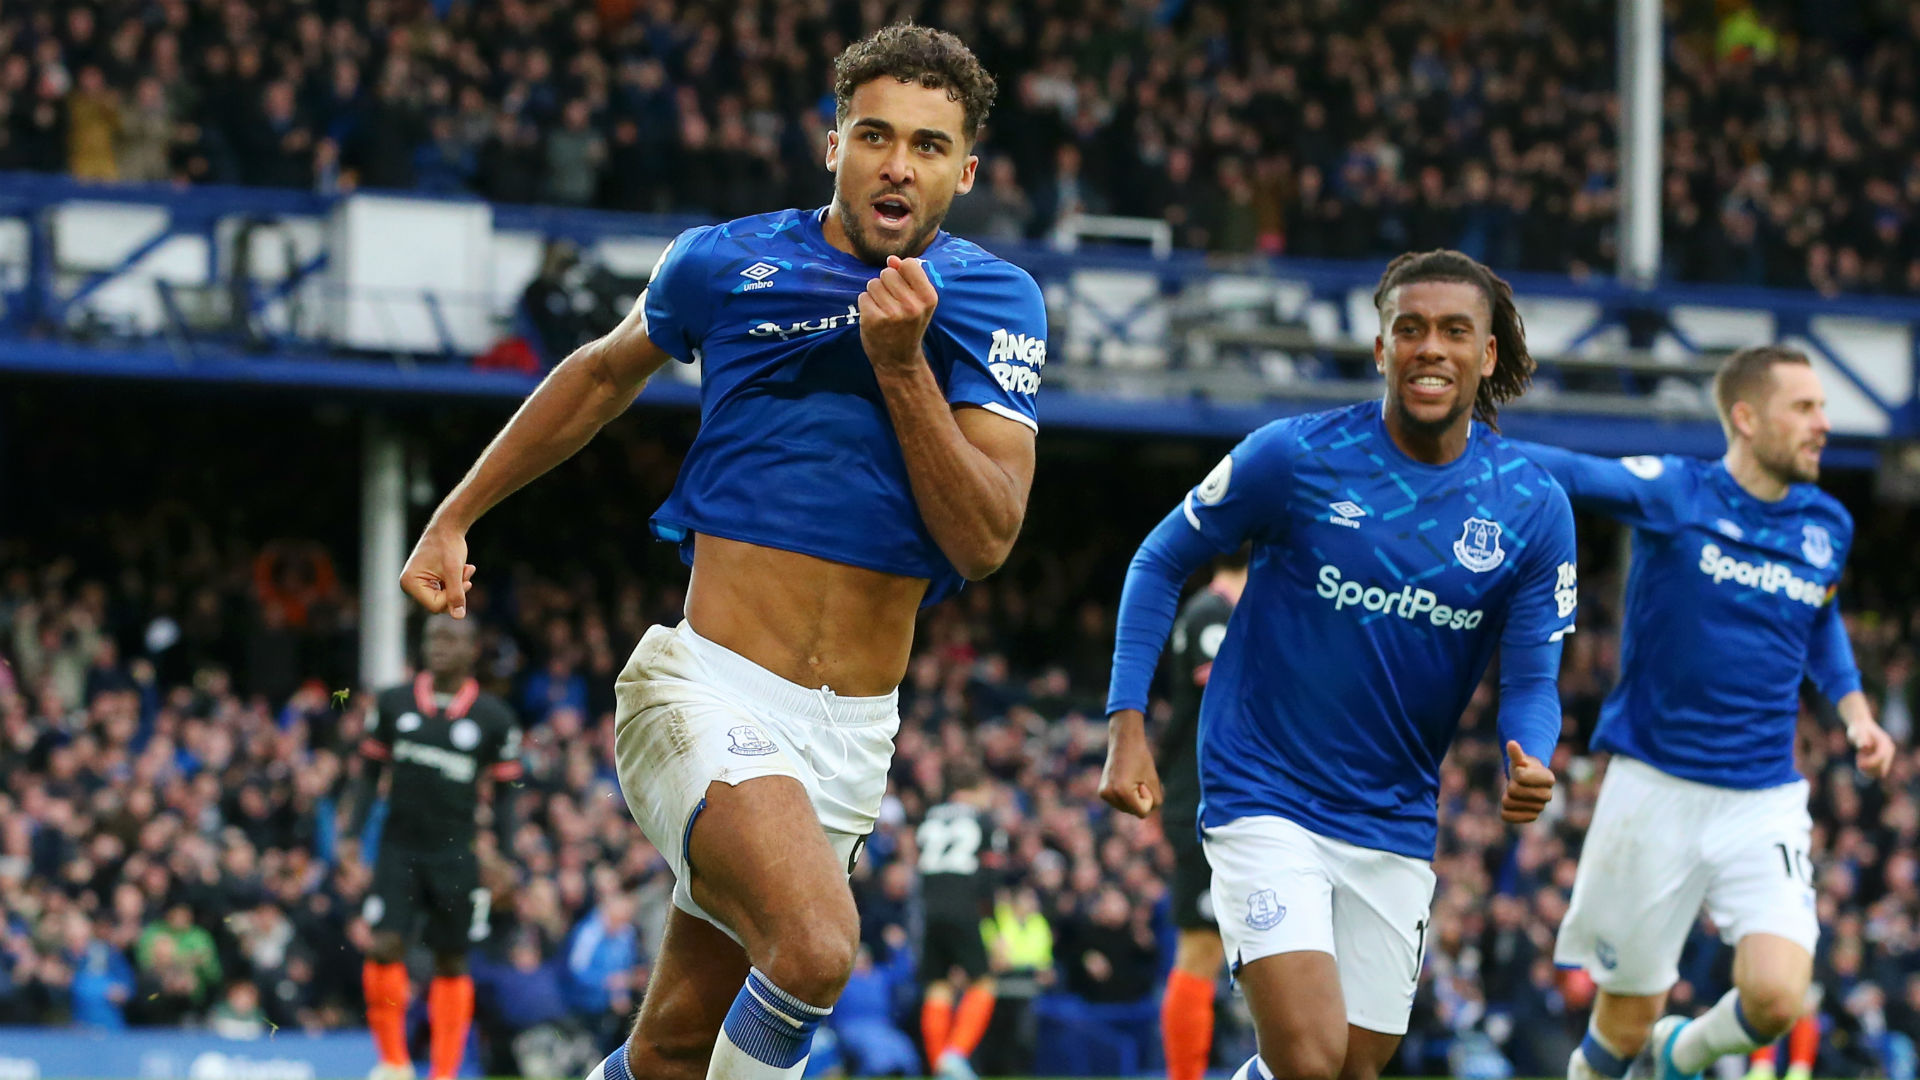 Everton 3-1 Chelsea: Calvert-Lewin at the double as Ferguson makes instant impact